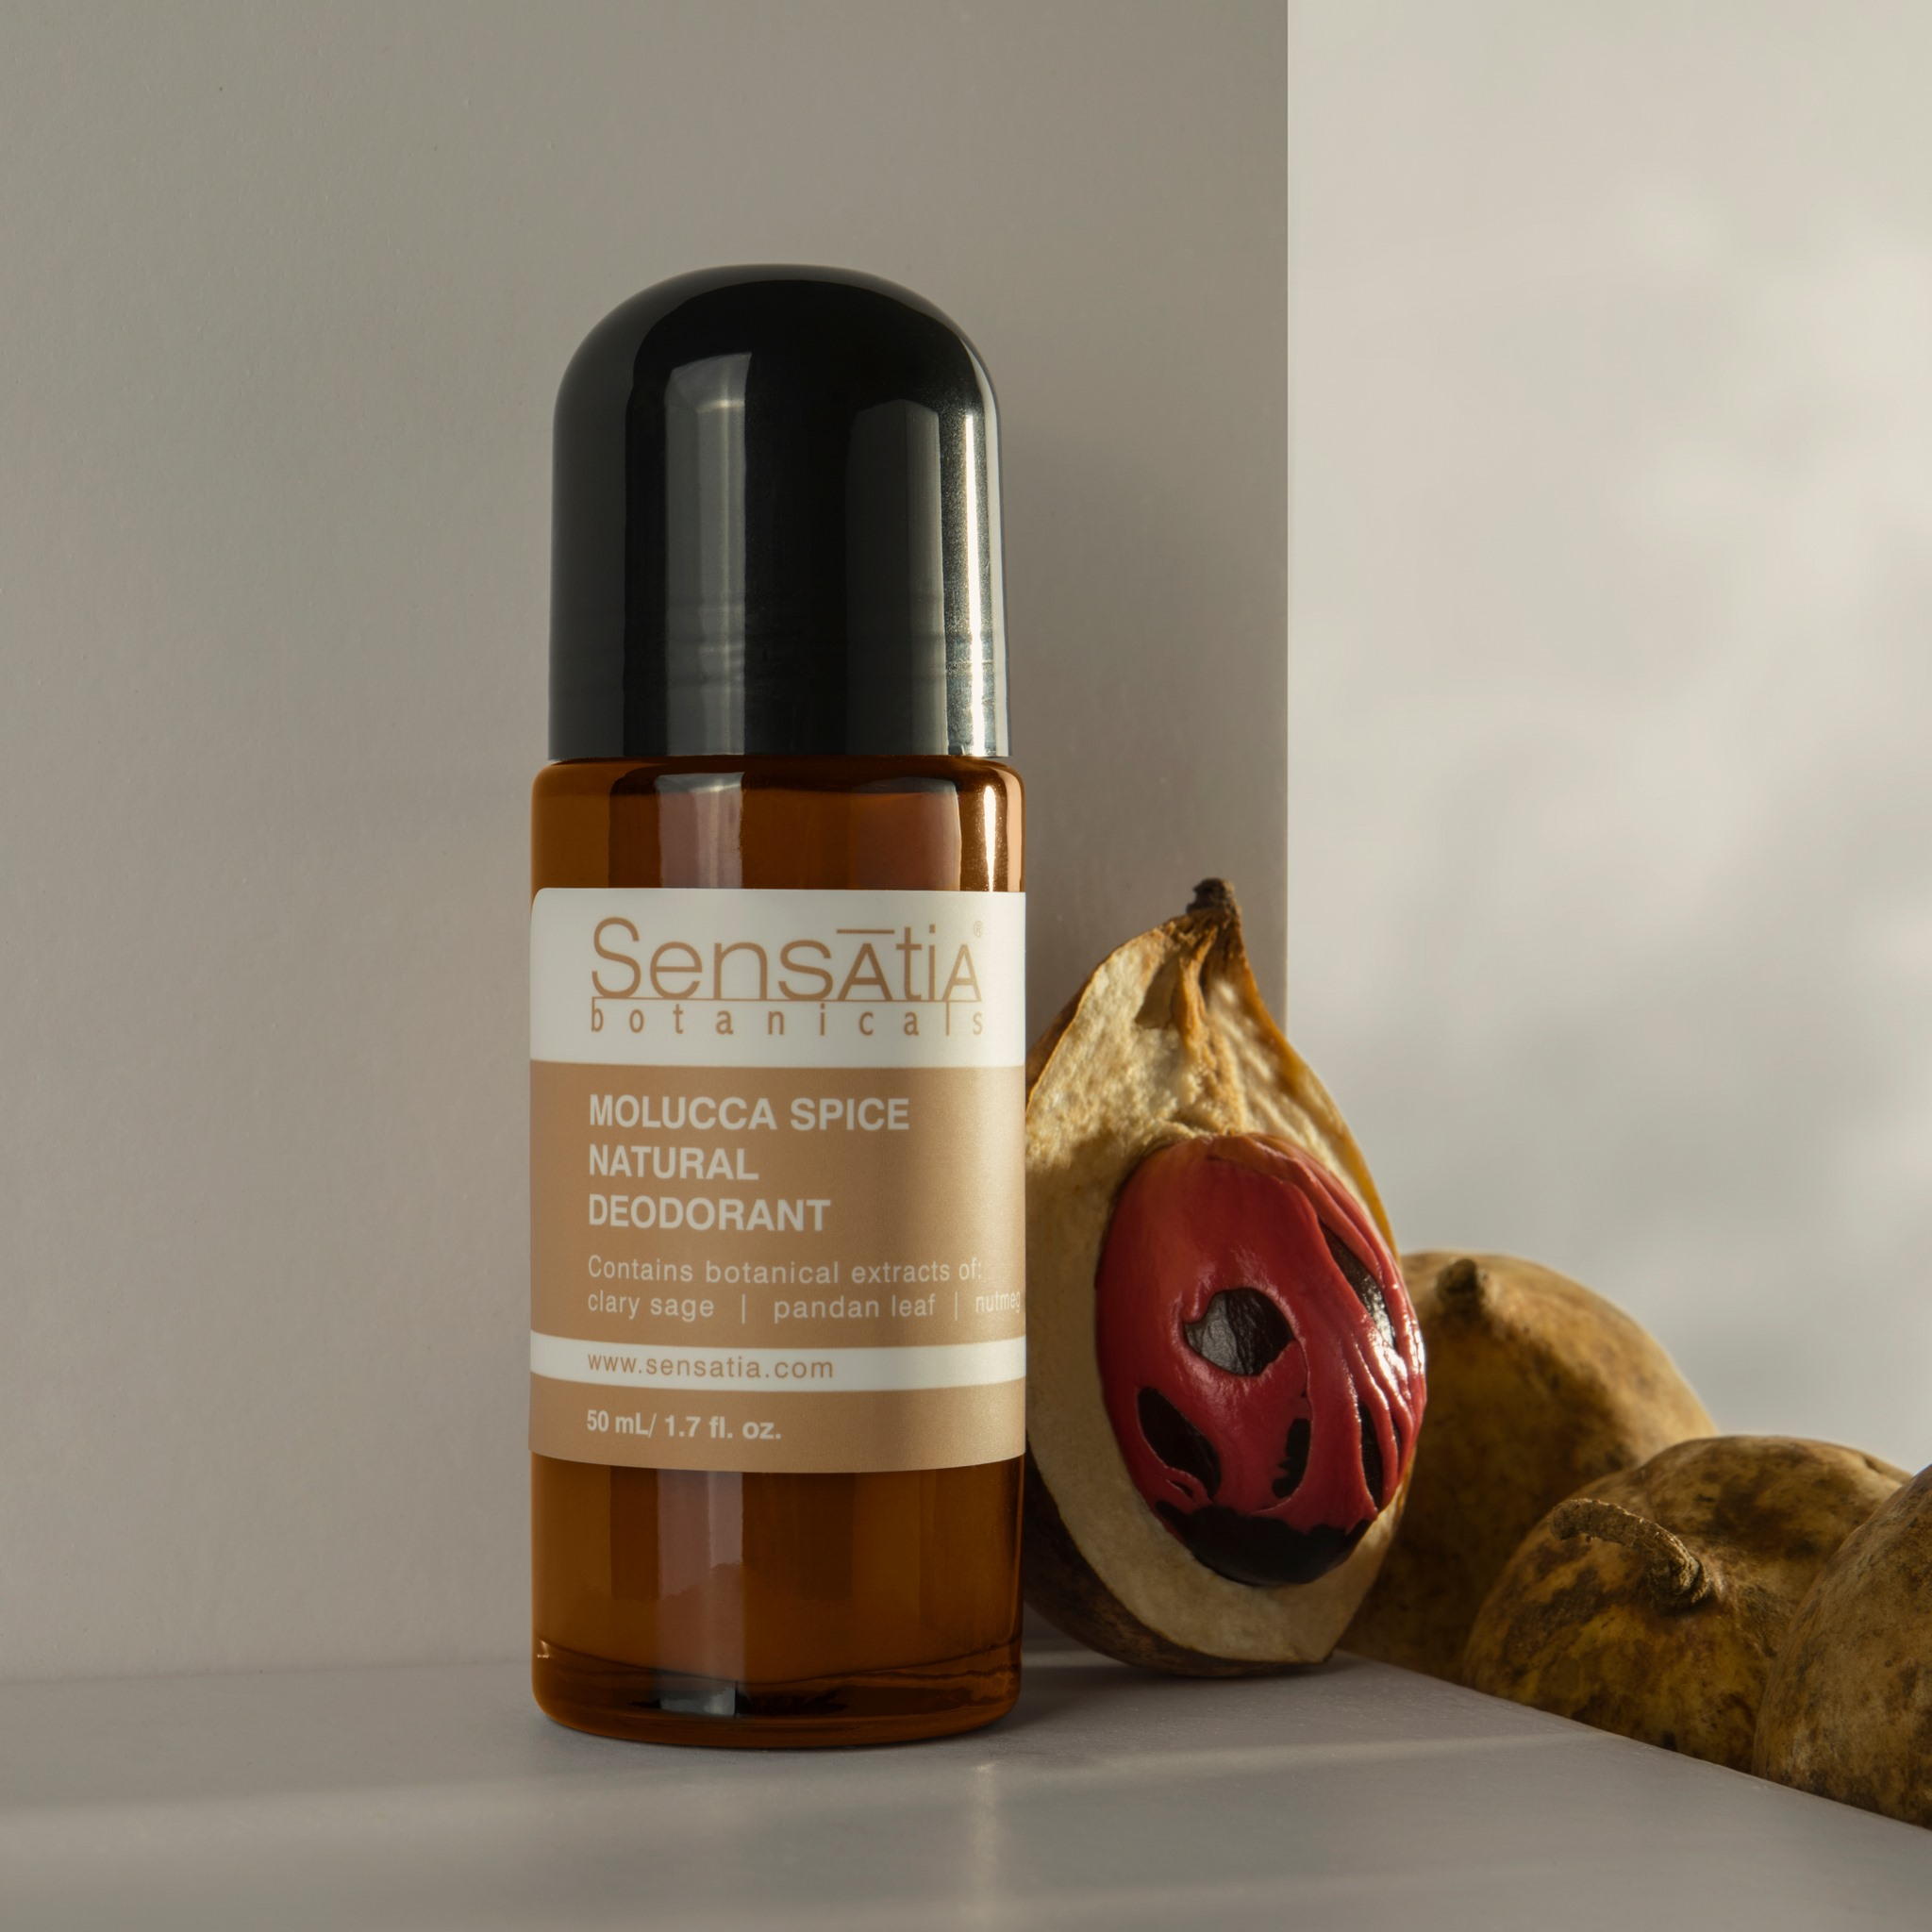 Sensatia Botanicals Molucca Spice Natural Deodorant